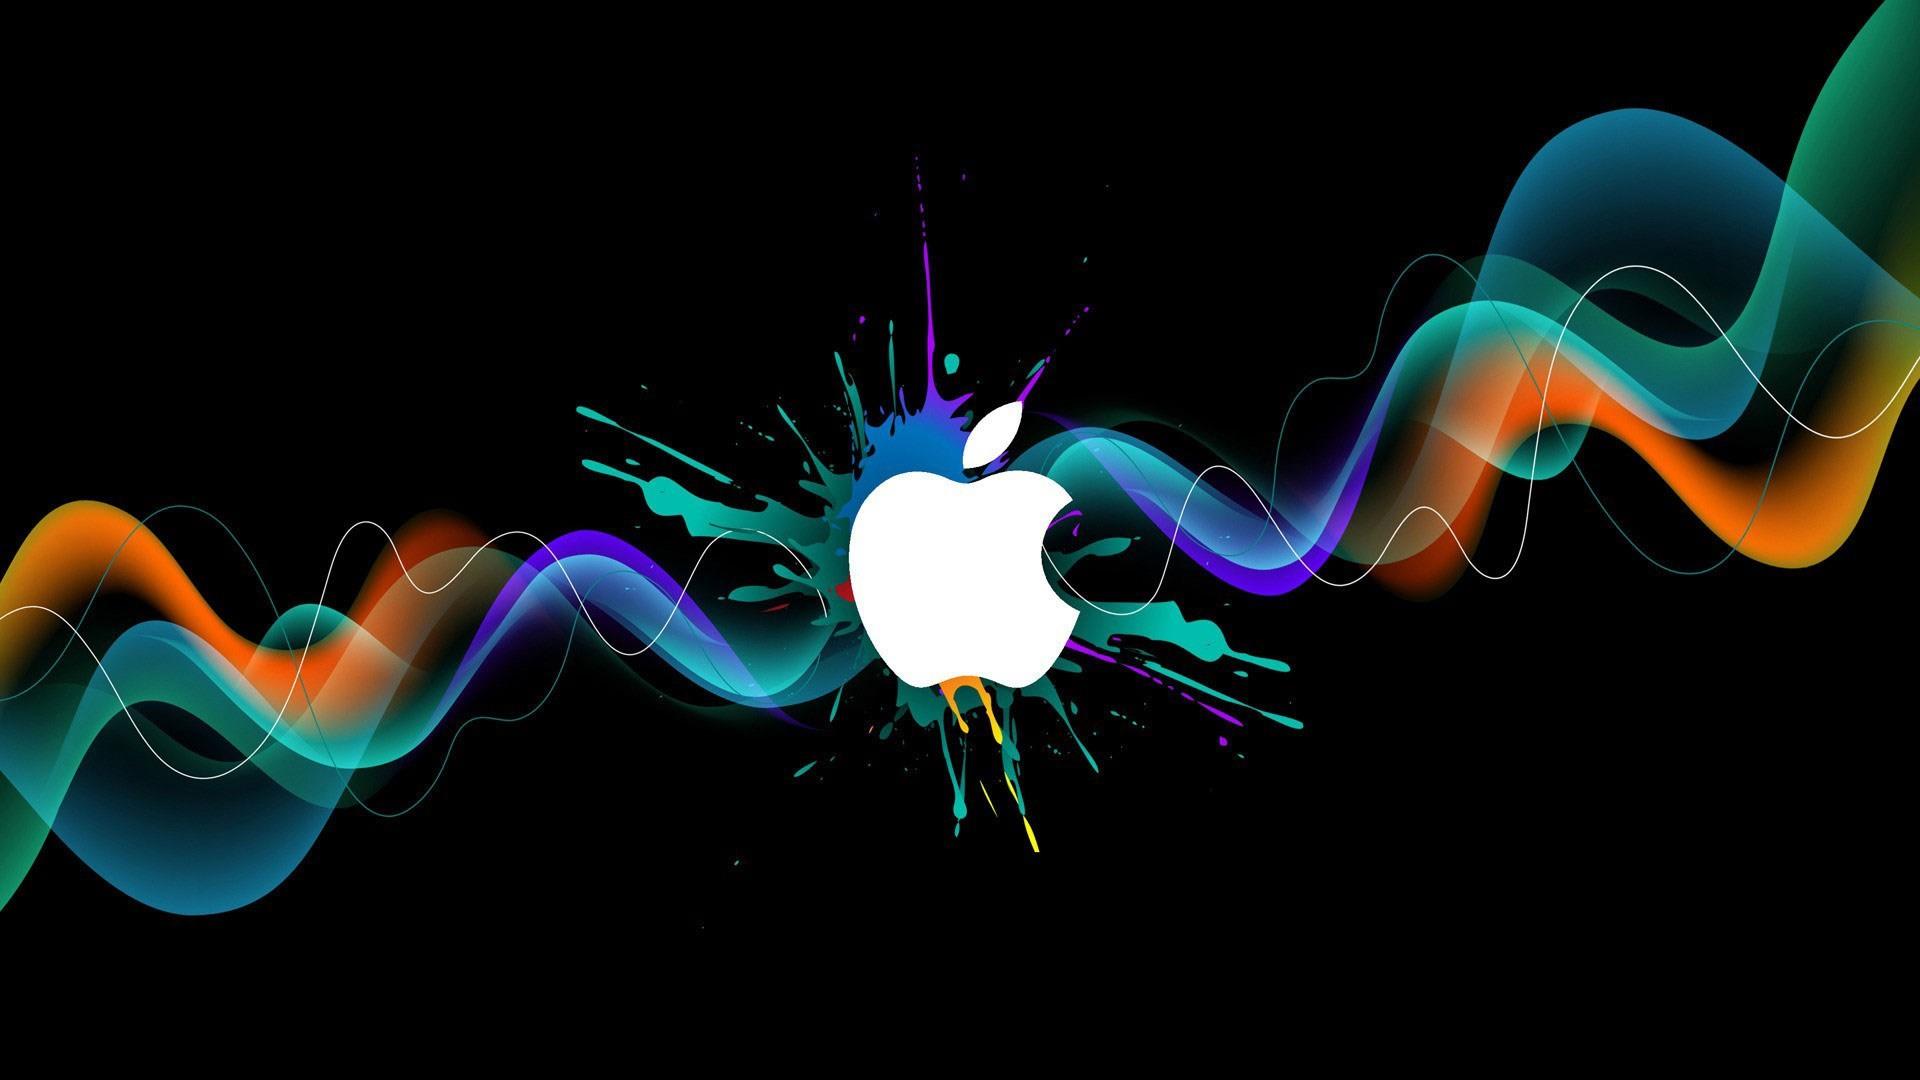 Res: 1920x1080, apple 3d wallpaper free download